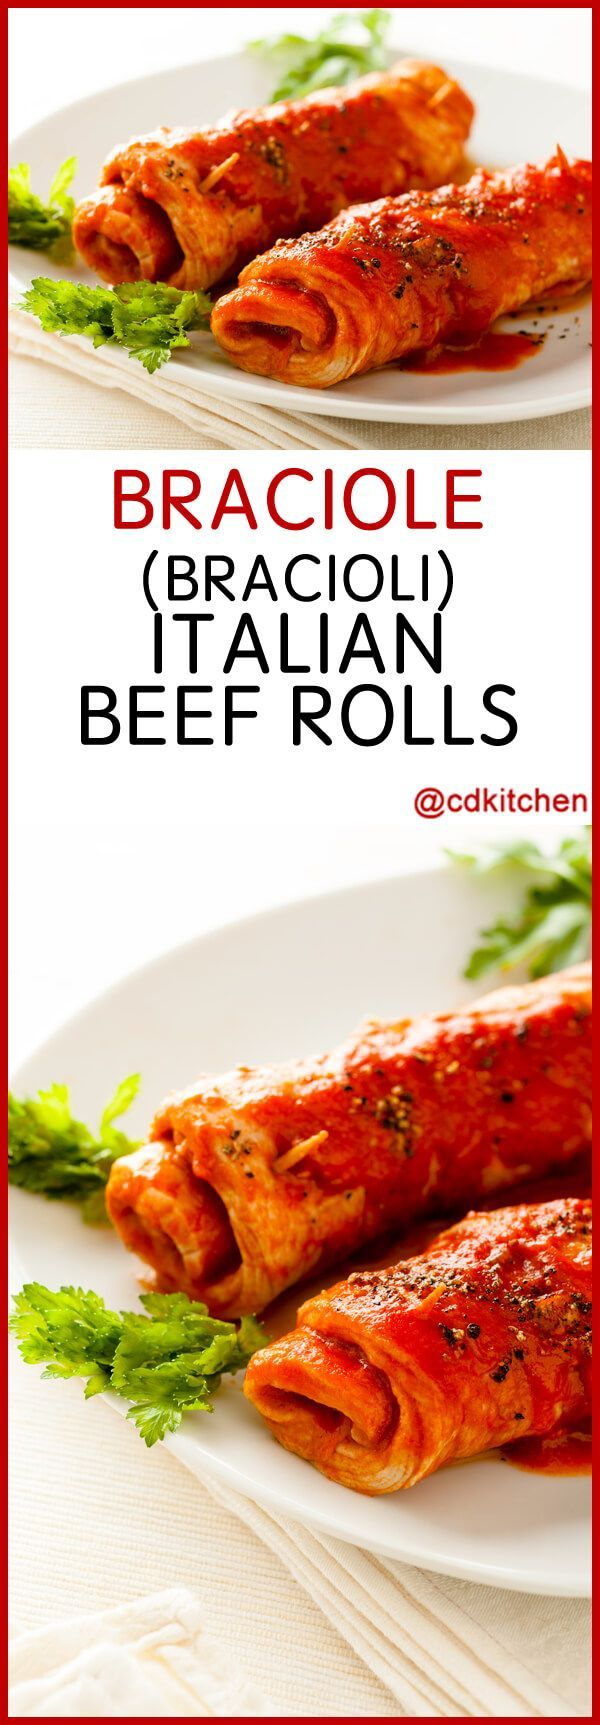 Braciole (Bracioli) Italian Beef Rolls - Recipe is made with plum tomatoes, oregano, yellow onion, beef top round, fresh parsley, fresh basil, pine nuts, raisins, garlic, sage, thyme, prosciutto, Parmesan cheese, salt and pepper, Mozzarella cheese | CDKitchen.com